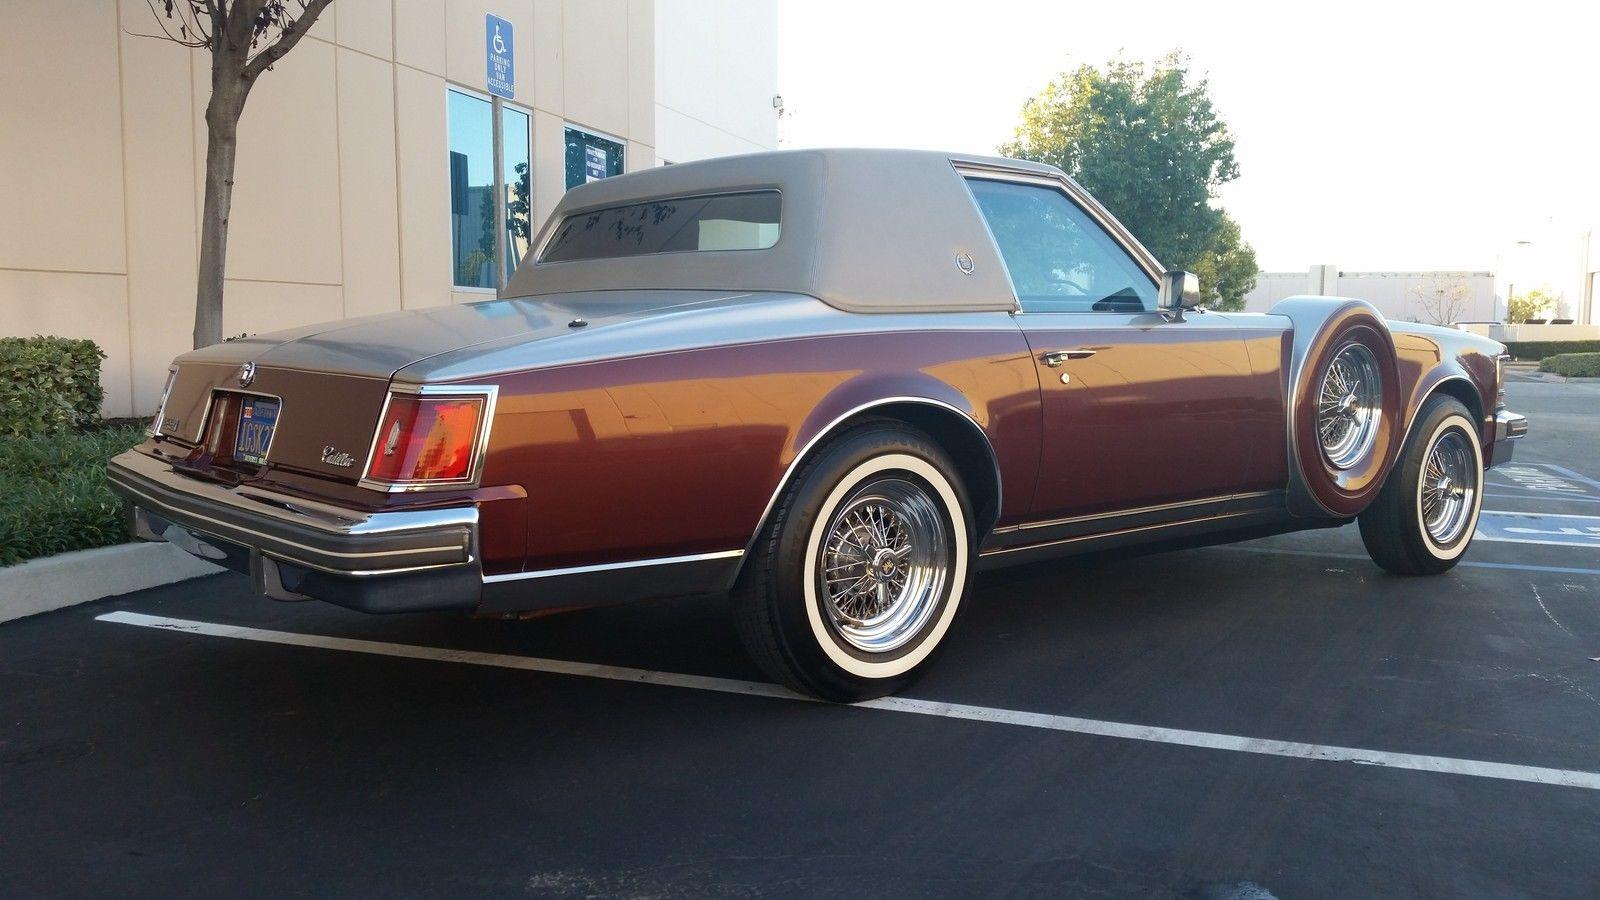 1978 Cadillac Seville Grandeur Opera Coupe >> 1978 Cadillac Opera Coupe Seville Grandeur Motor Car Corporation